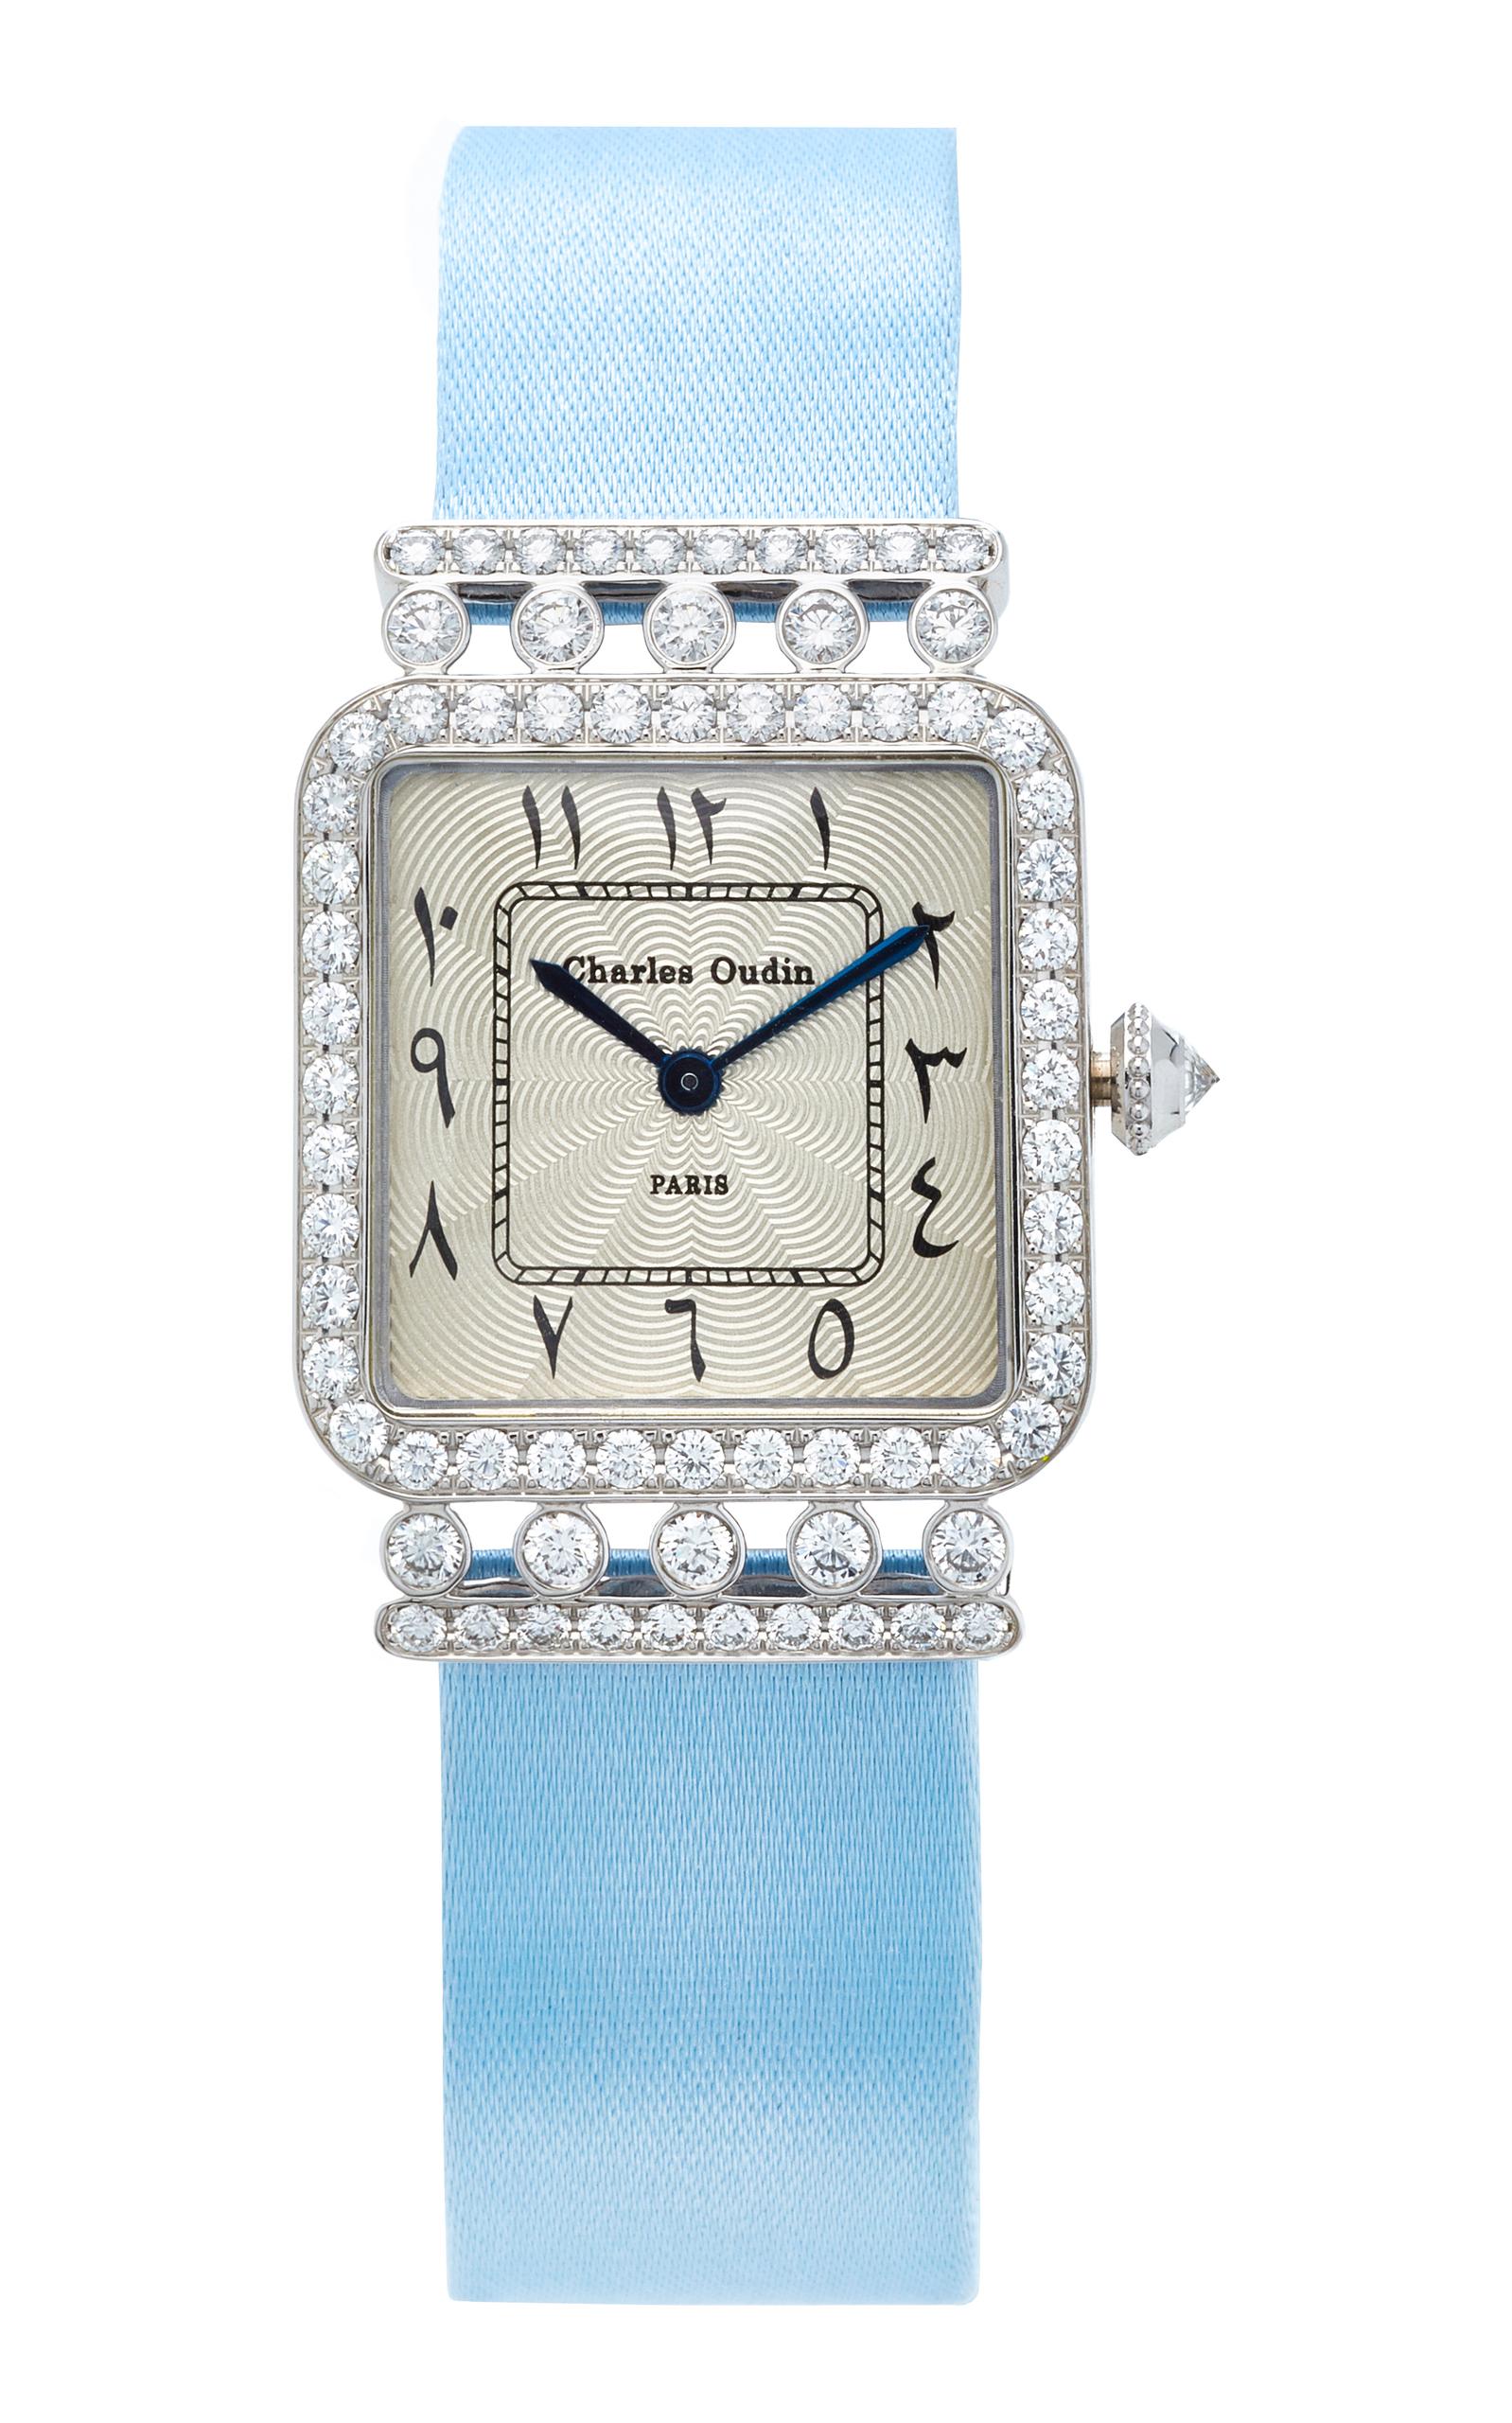 CHARLES OUDIN 18K White Gold Diamond Iris Retro Watch